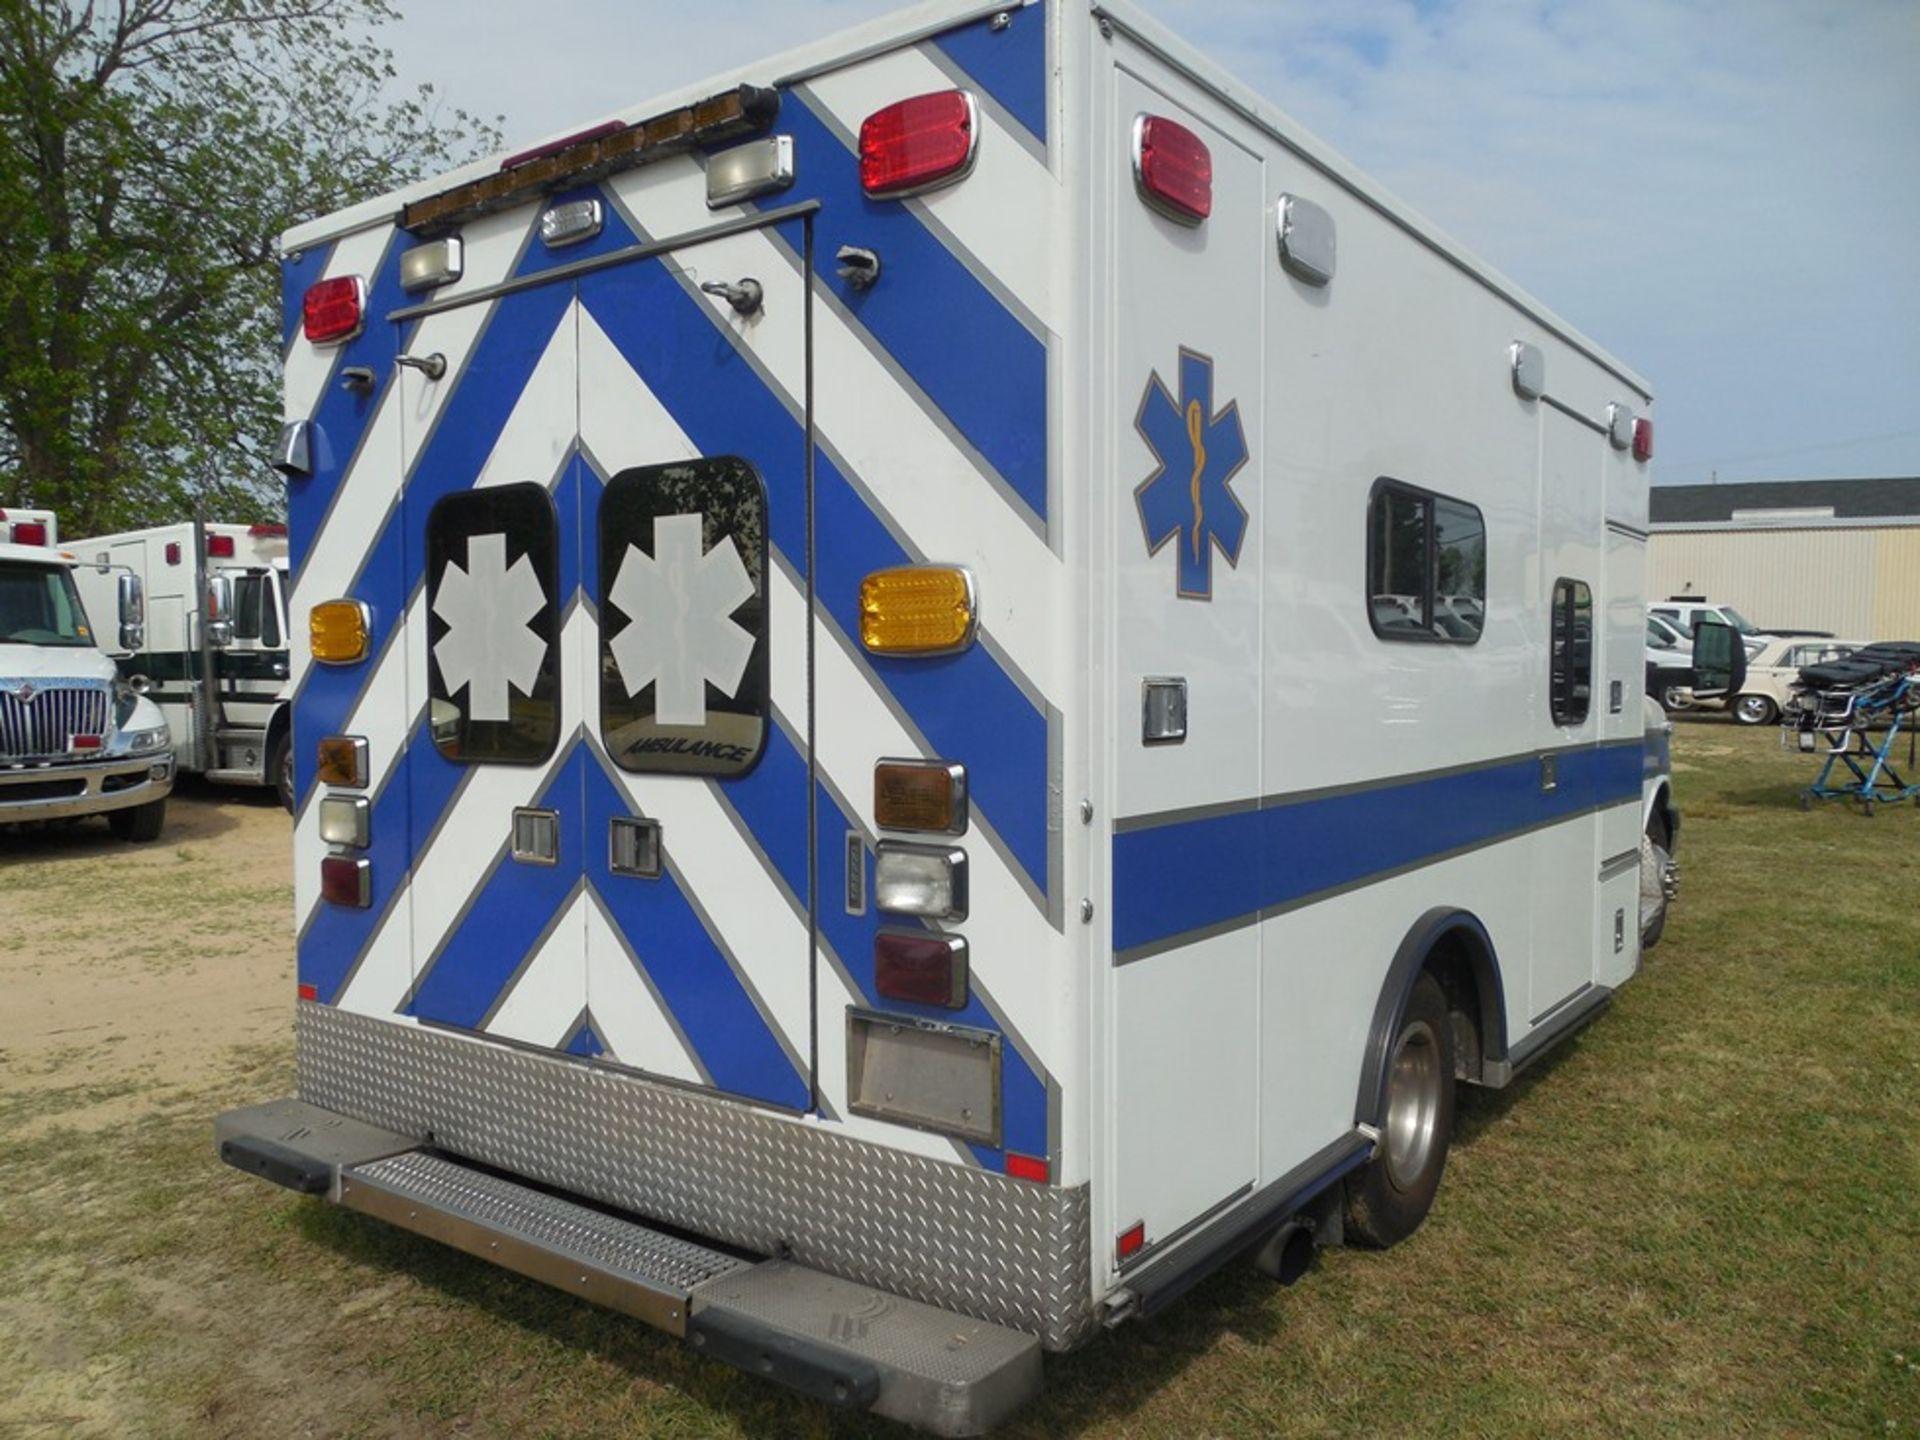 2010 Chev 4500 dsl box ambulance 258,589 miles, vin# 1GB9G5B6XA1132748 - Image 4 of 6